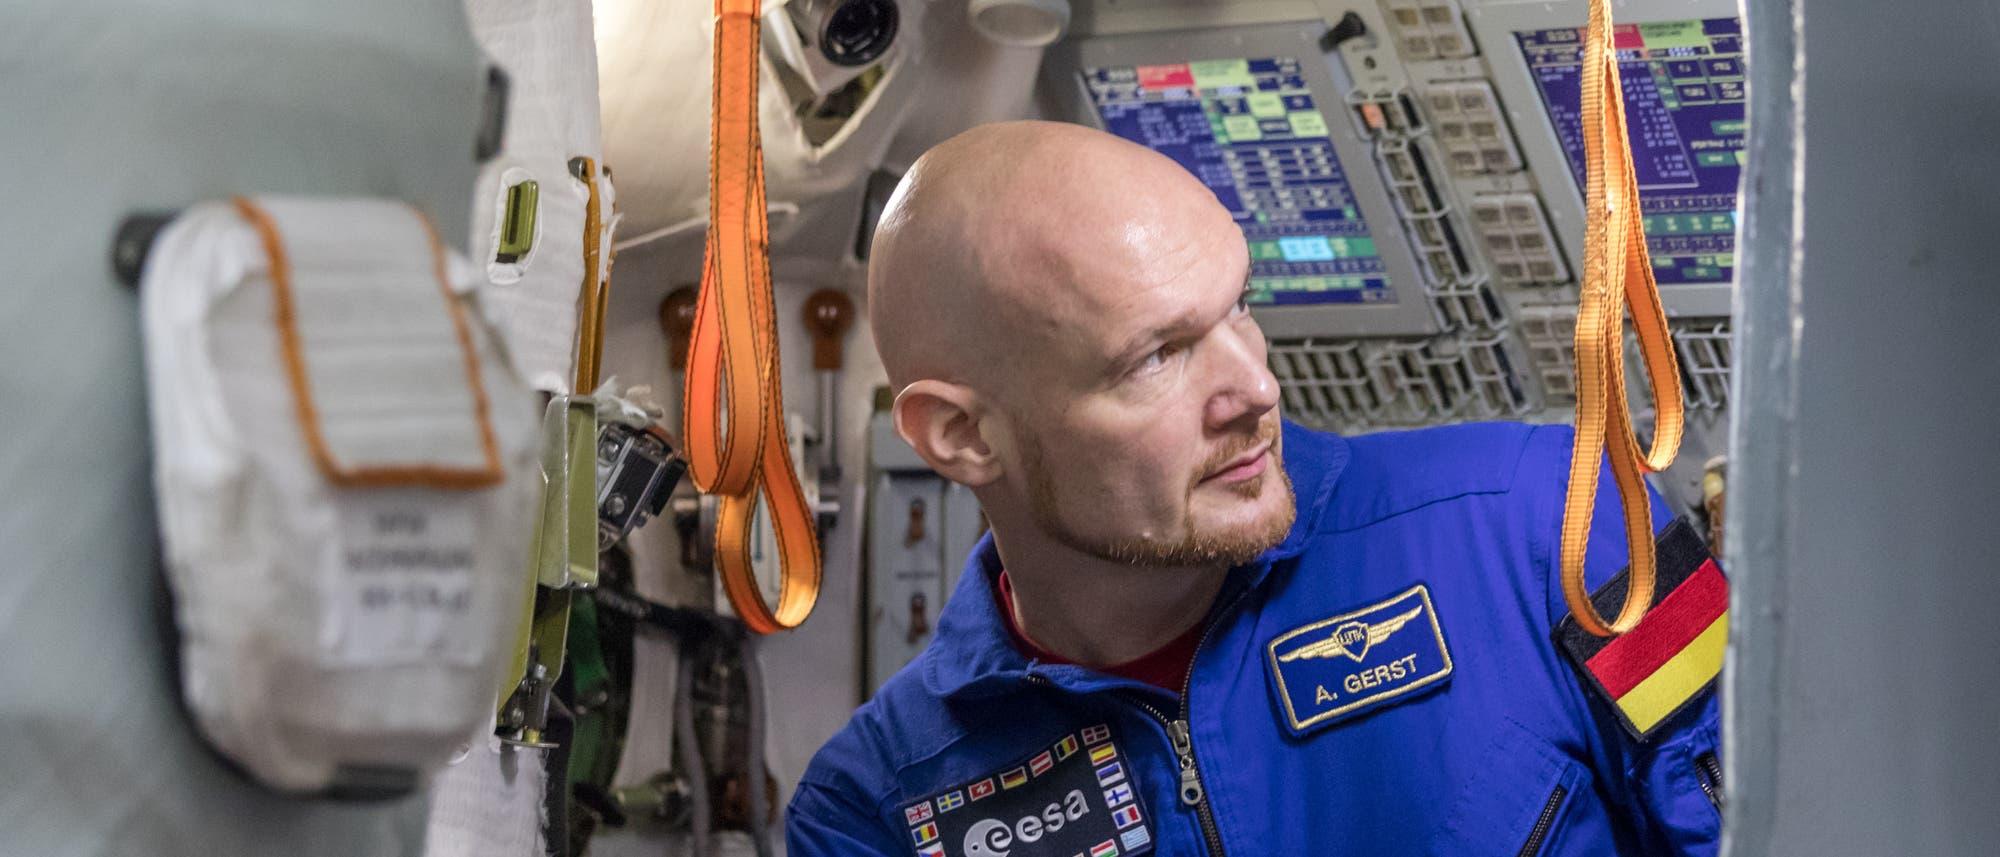 Kosmonaut Alexander Gerst